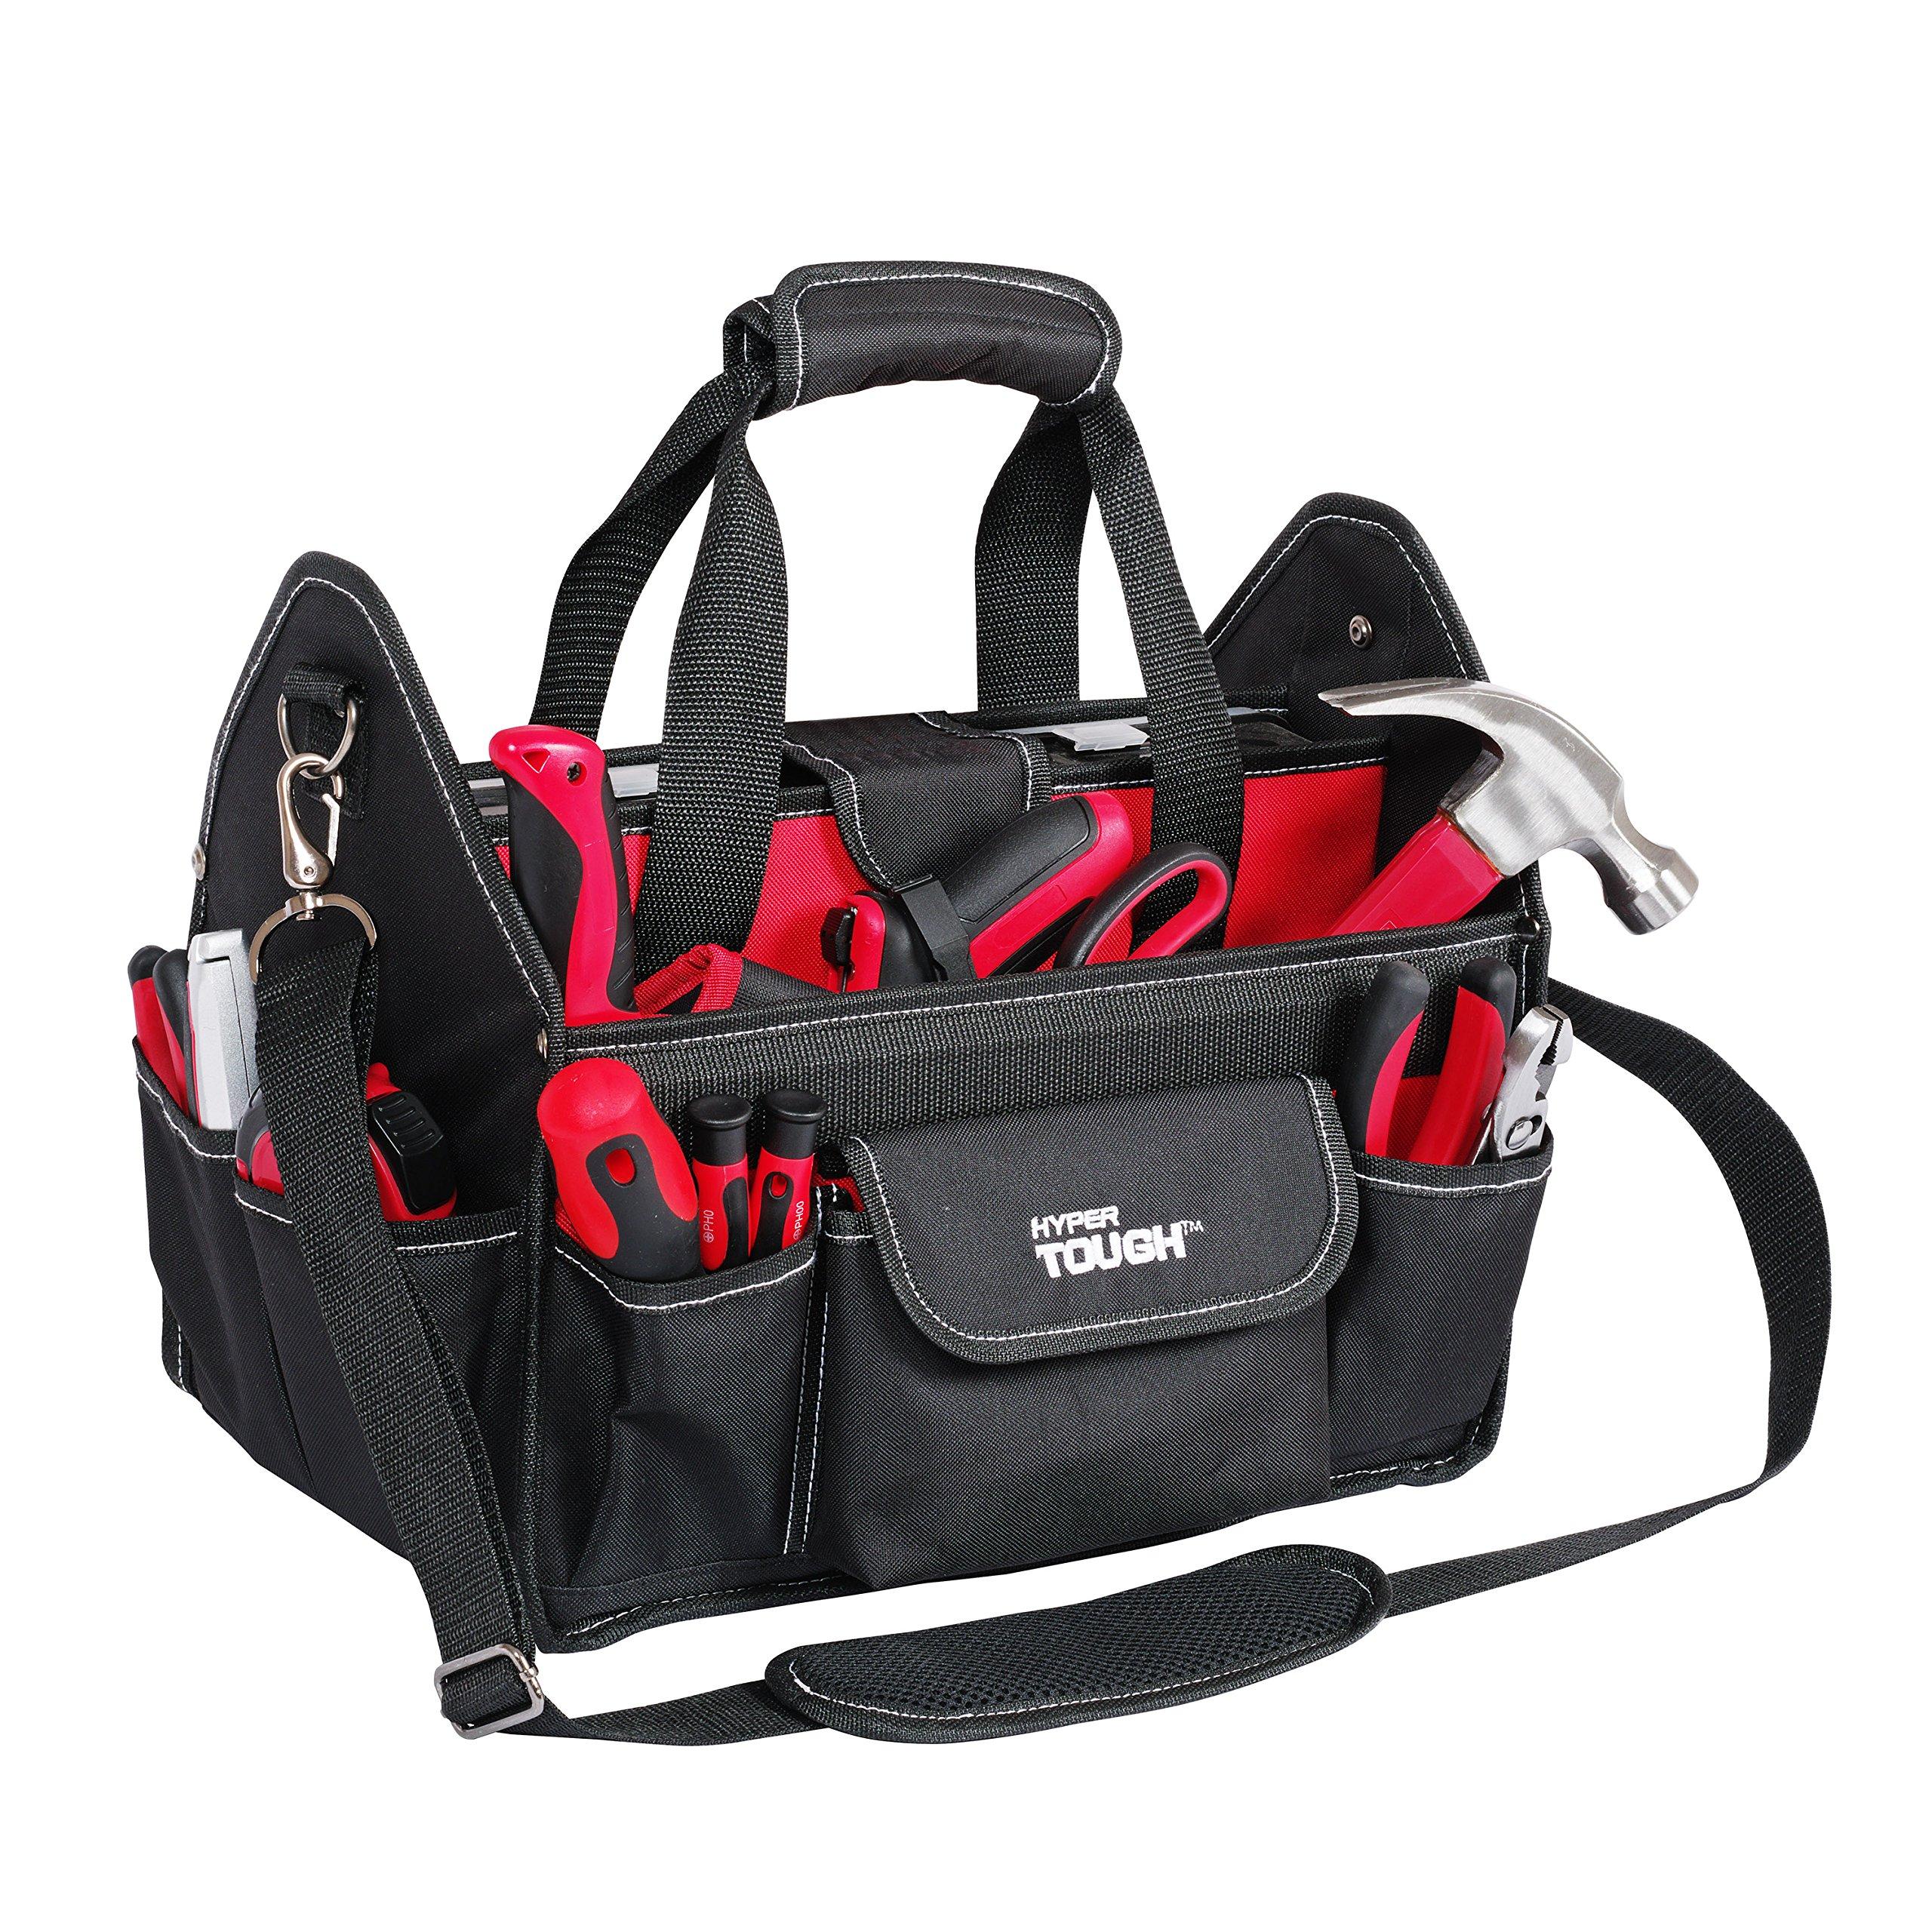 Hyper Tough Tool Set 22 pieces with Bag